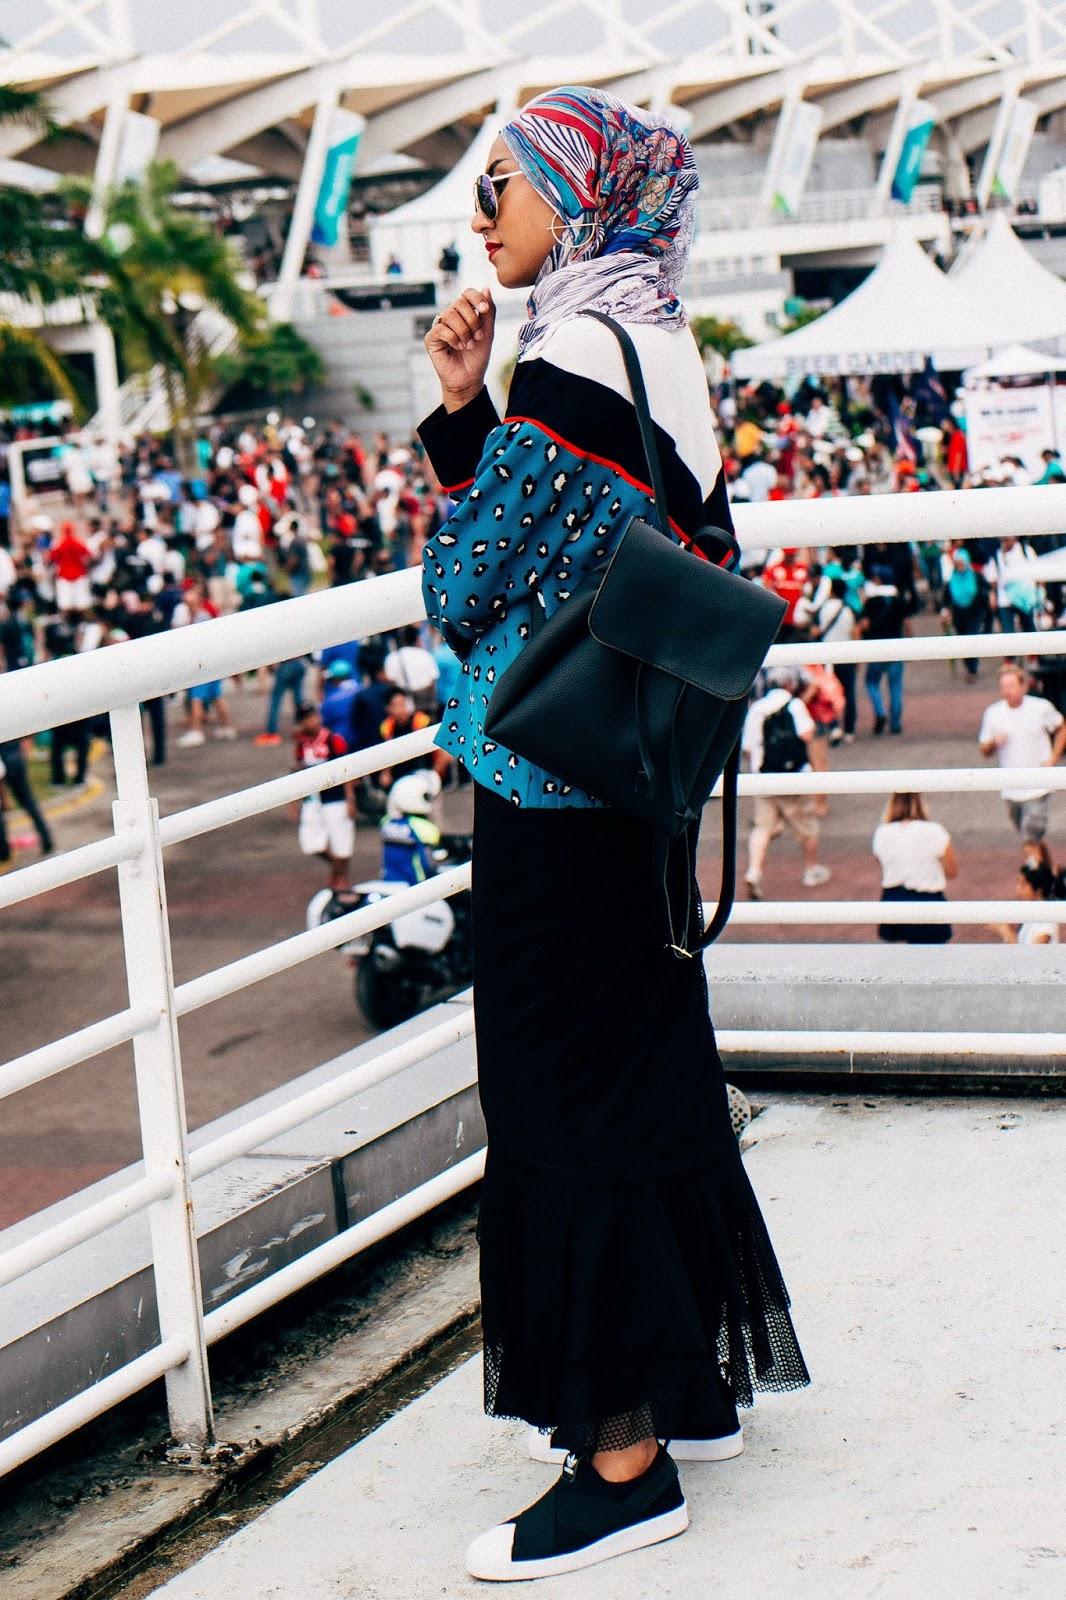 Zara Teal Leopard Top Zara eyelet skirt Adidas Superstar Slip-Ons